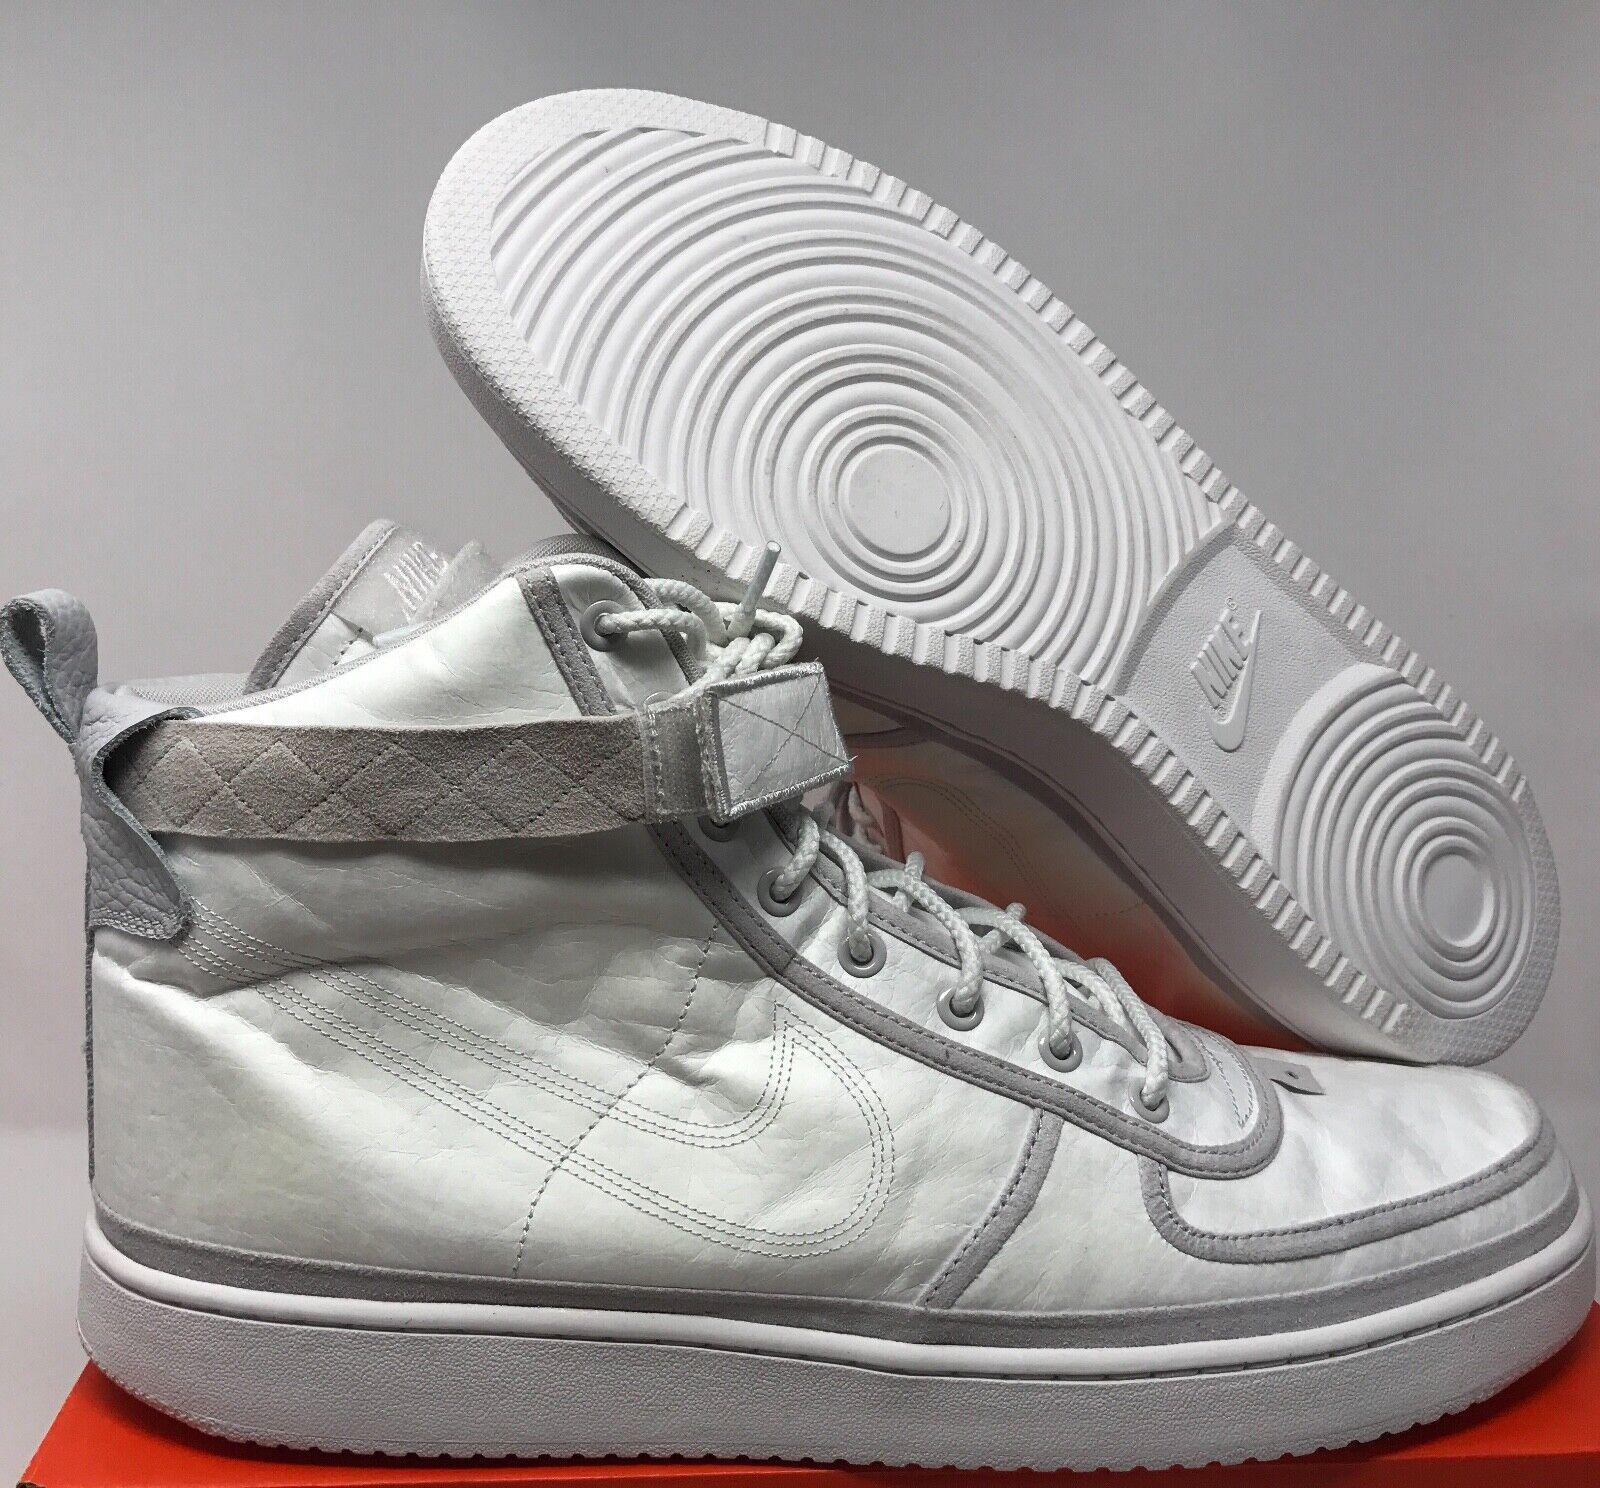 Nike Vandal High Supreme AS QS ALL STAR VAST GREY-WHITE SZ 15 [AQ0113-001]